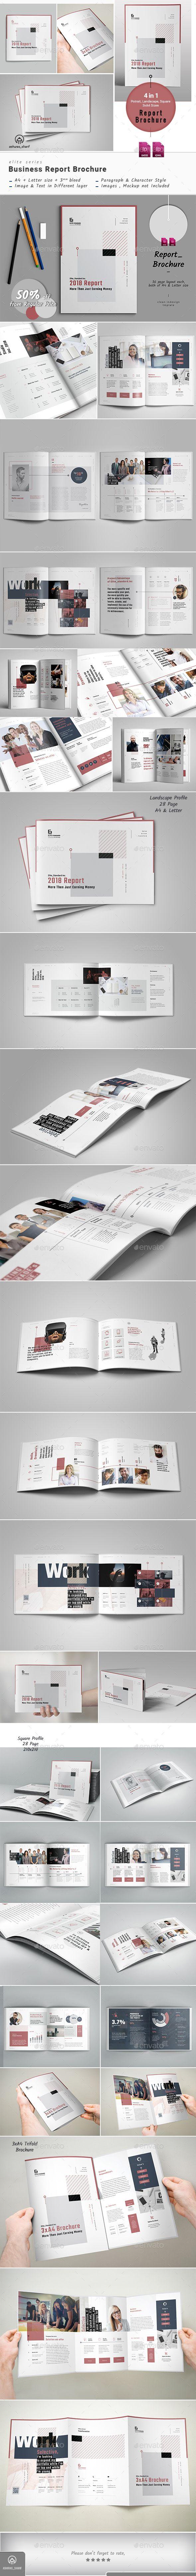 Annual Report Bundle | Pinterest